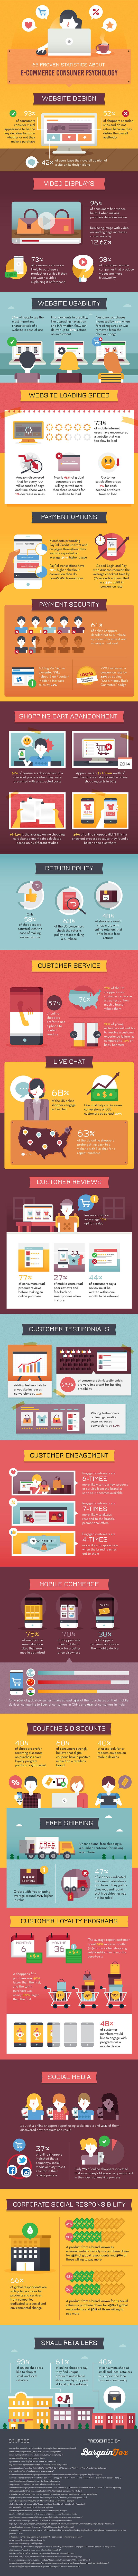 E-Commerce: 65 Fakten zum Online-Kaufverhalten [INFOGRAFIK]